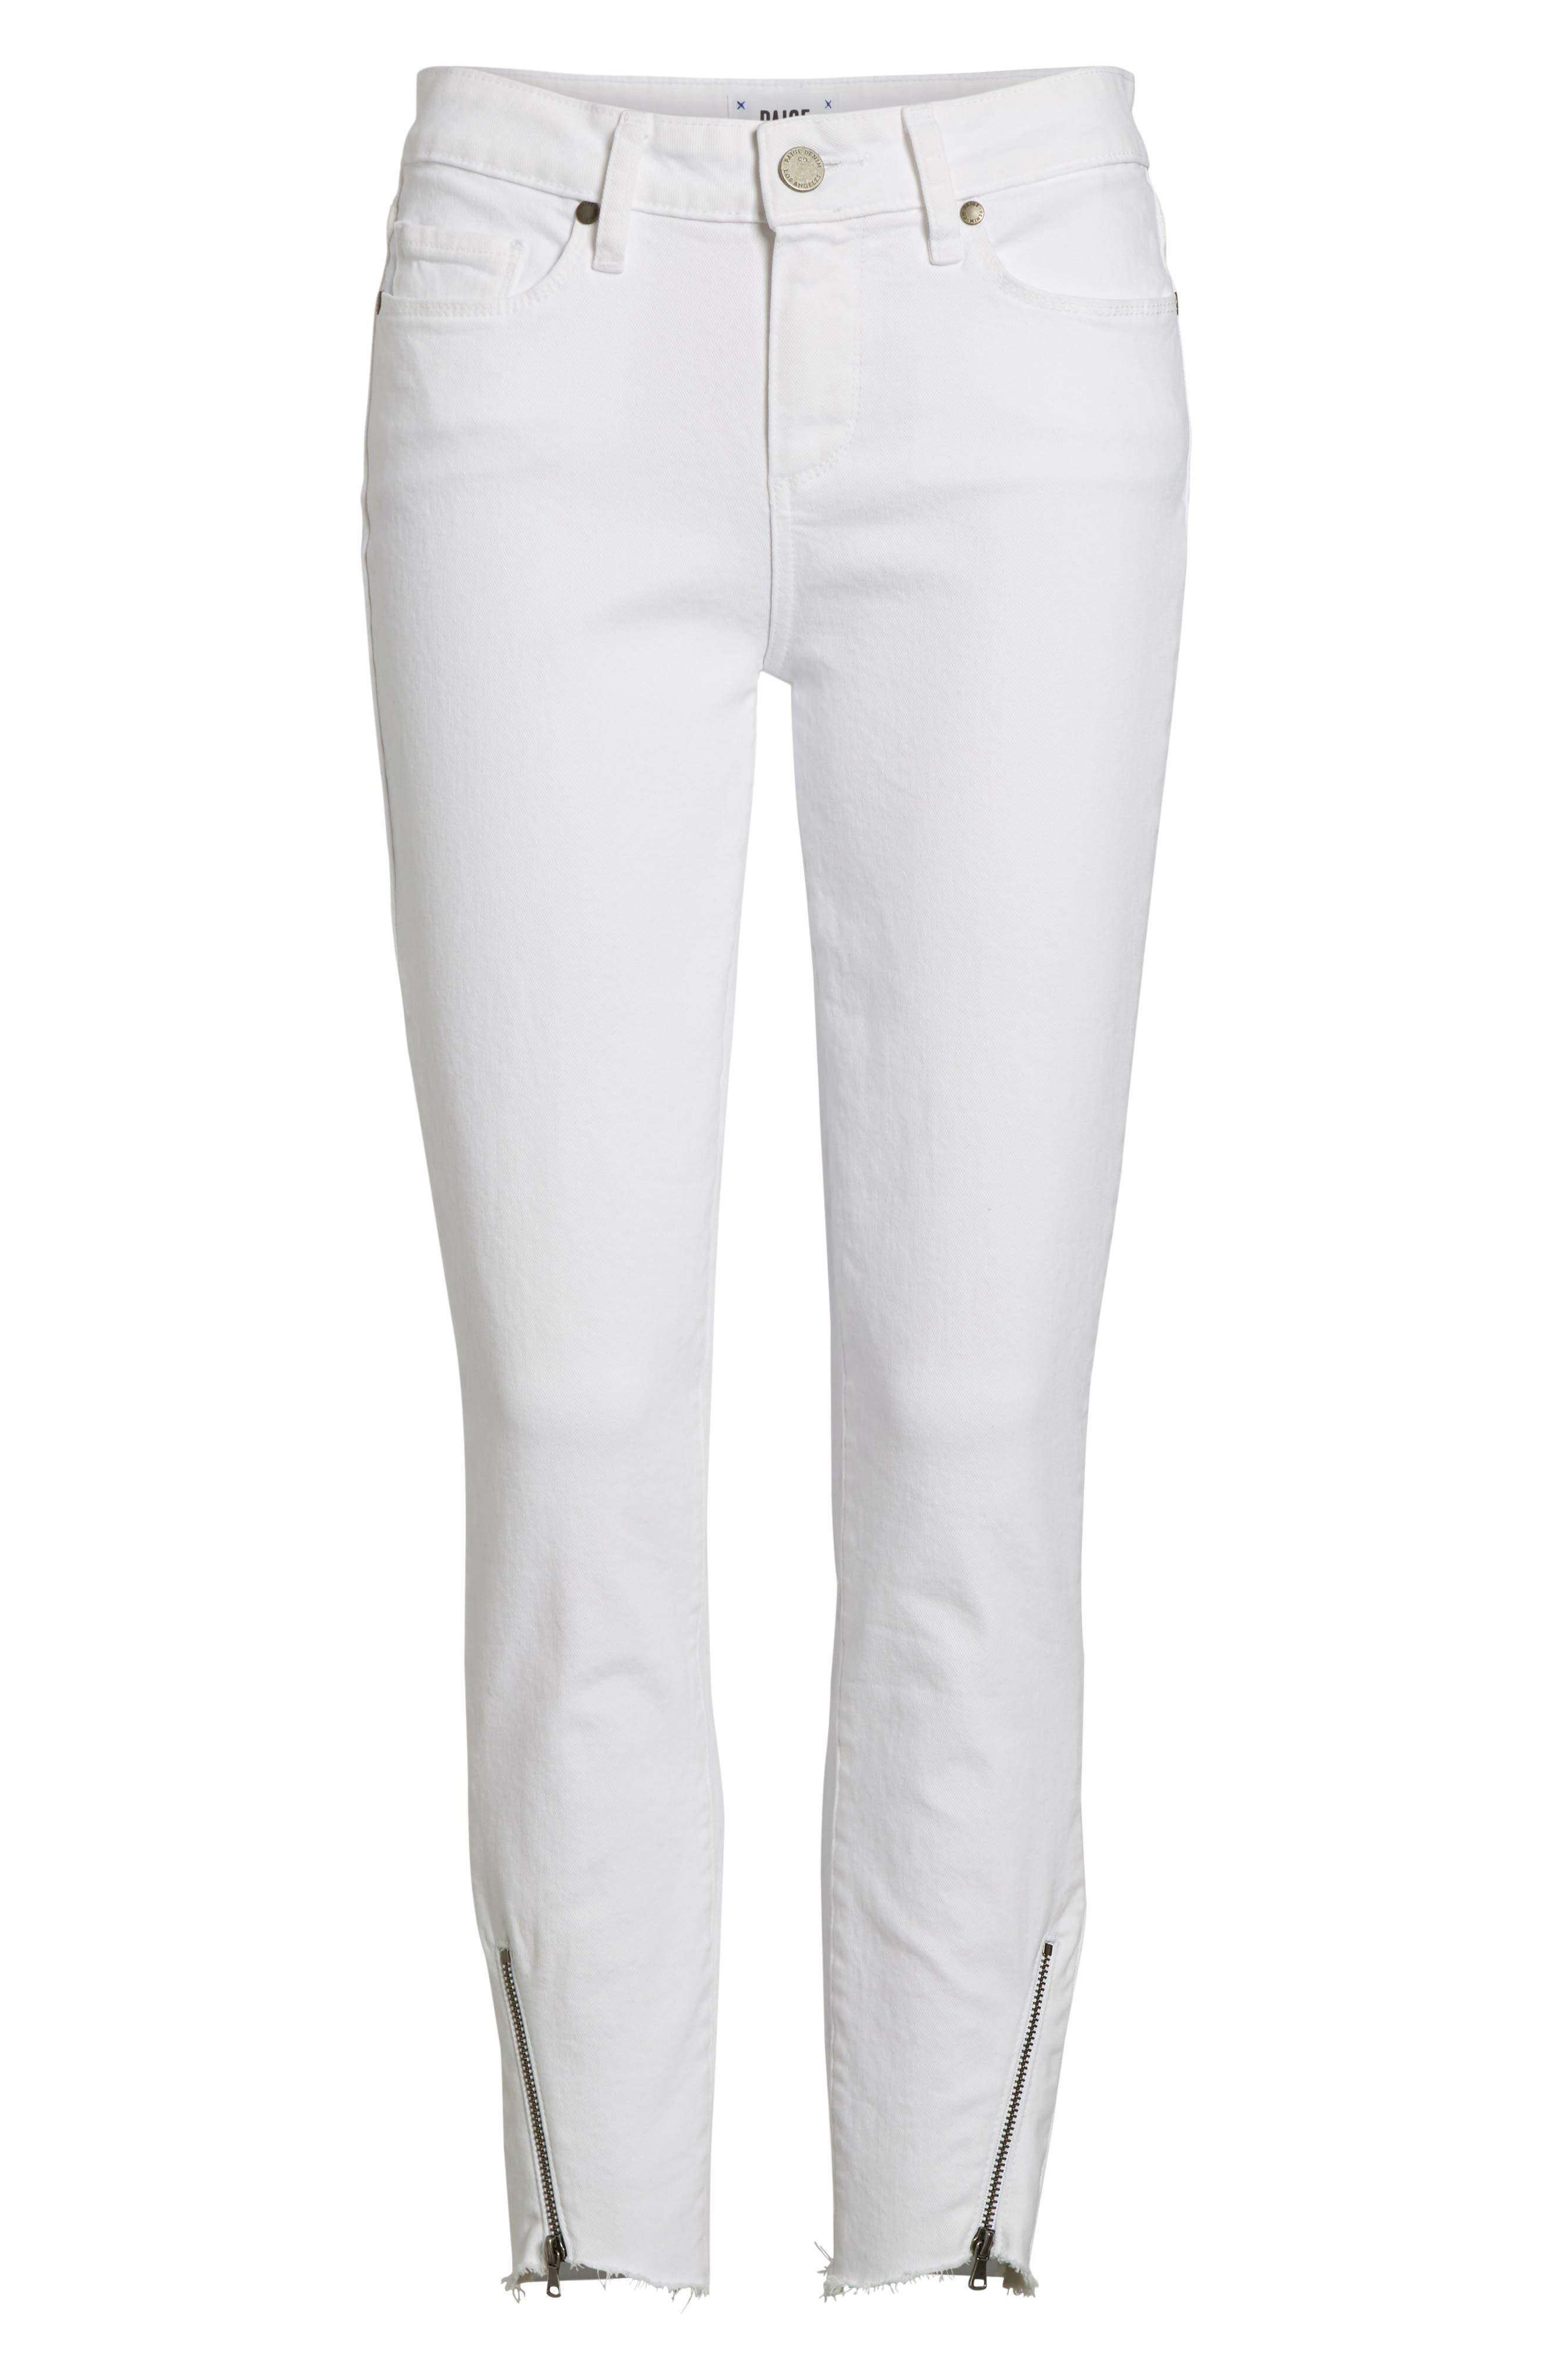 Verdugo Crop Ultra Skinny Jeans,                             Alternate thumbnail 7, color,                             Crisp White